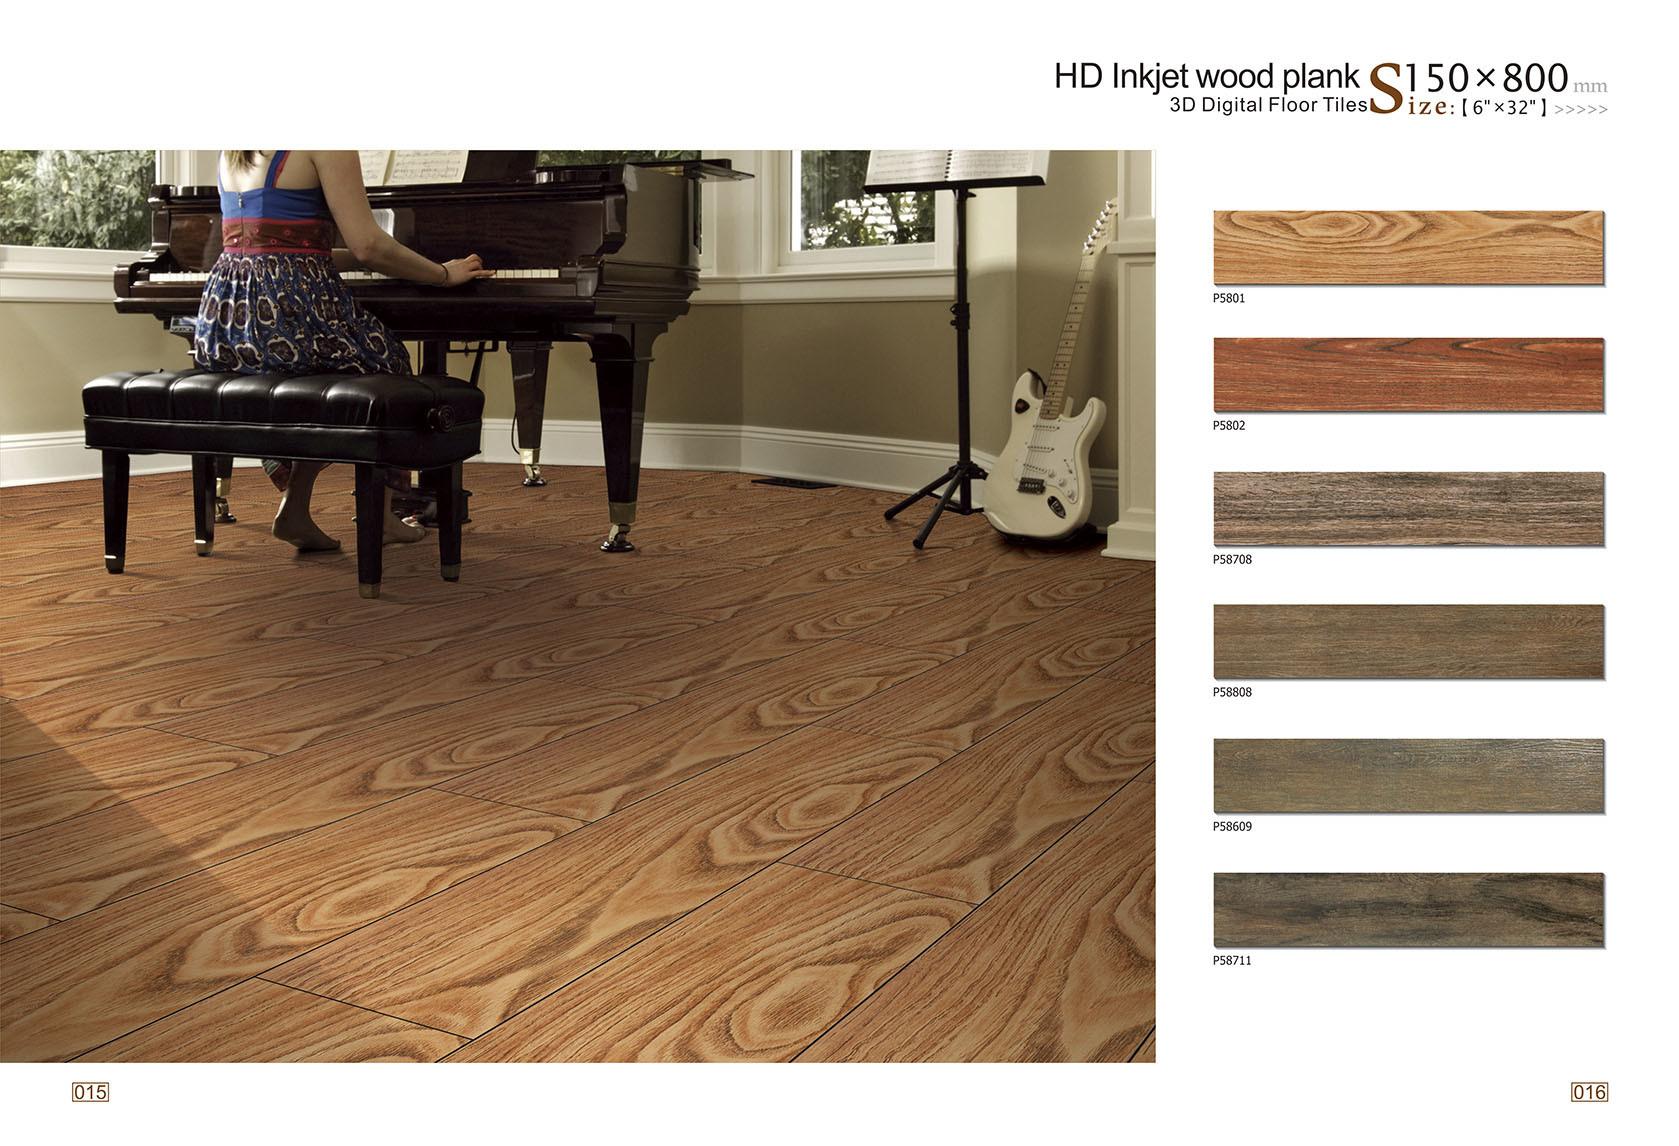 China Hot Sell Glazed Wood Finish Porcelain Floor Tile P5801